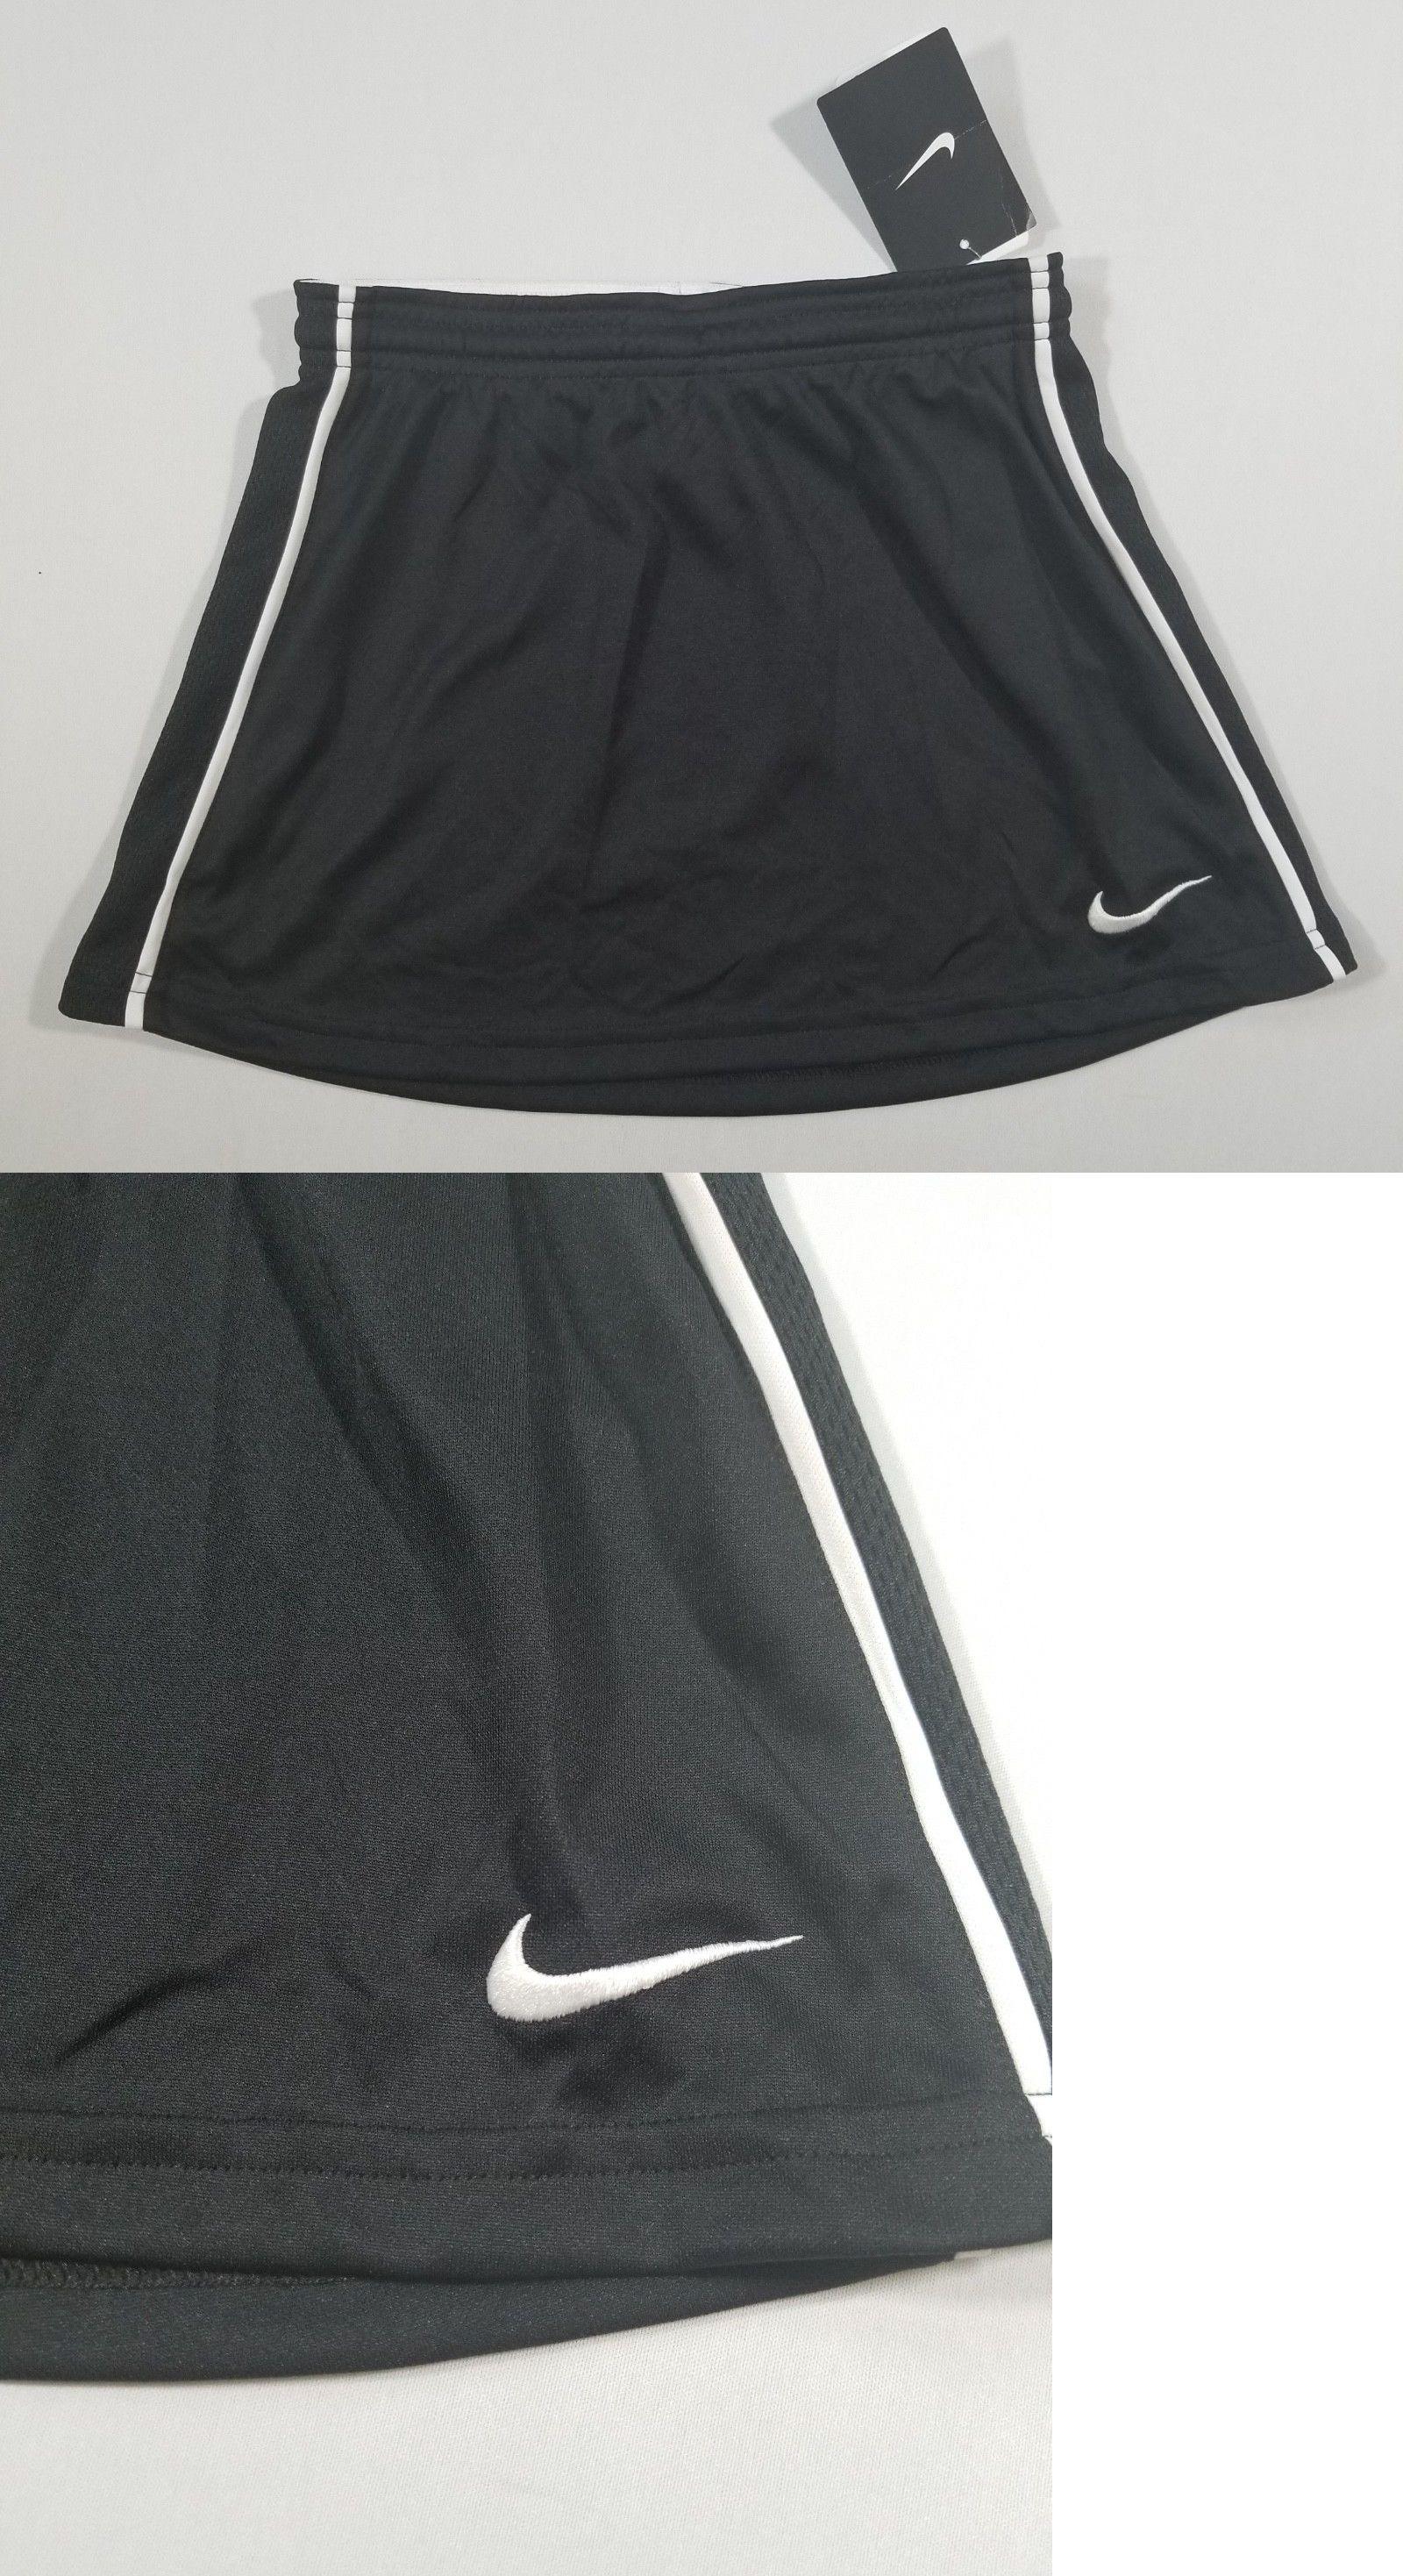 aabfeb45989b Clothing 159152  Nike Girls Respect Lacrosse Kilt